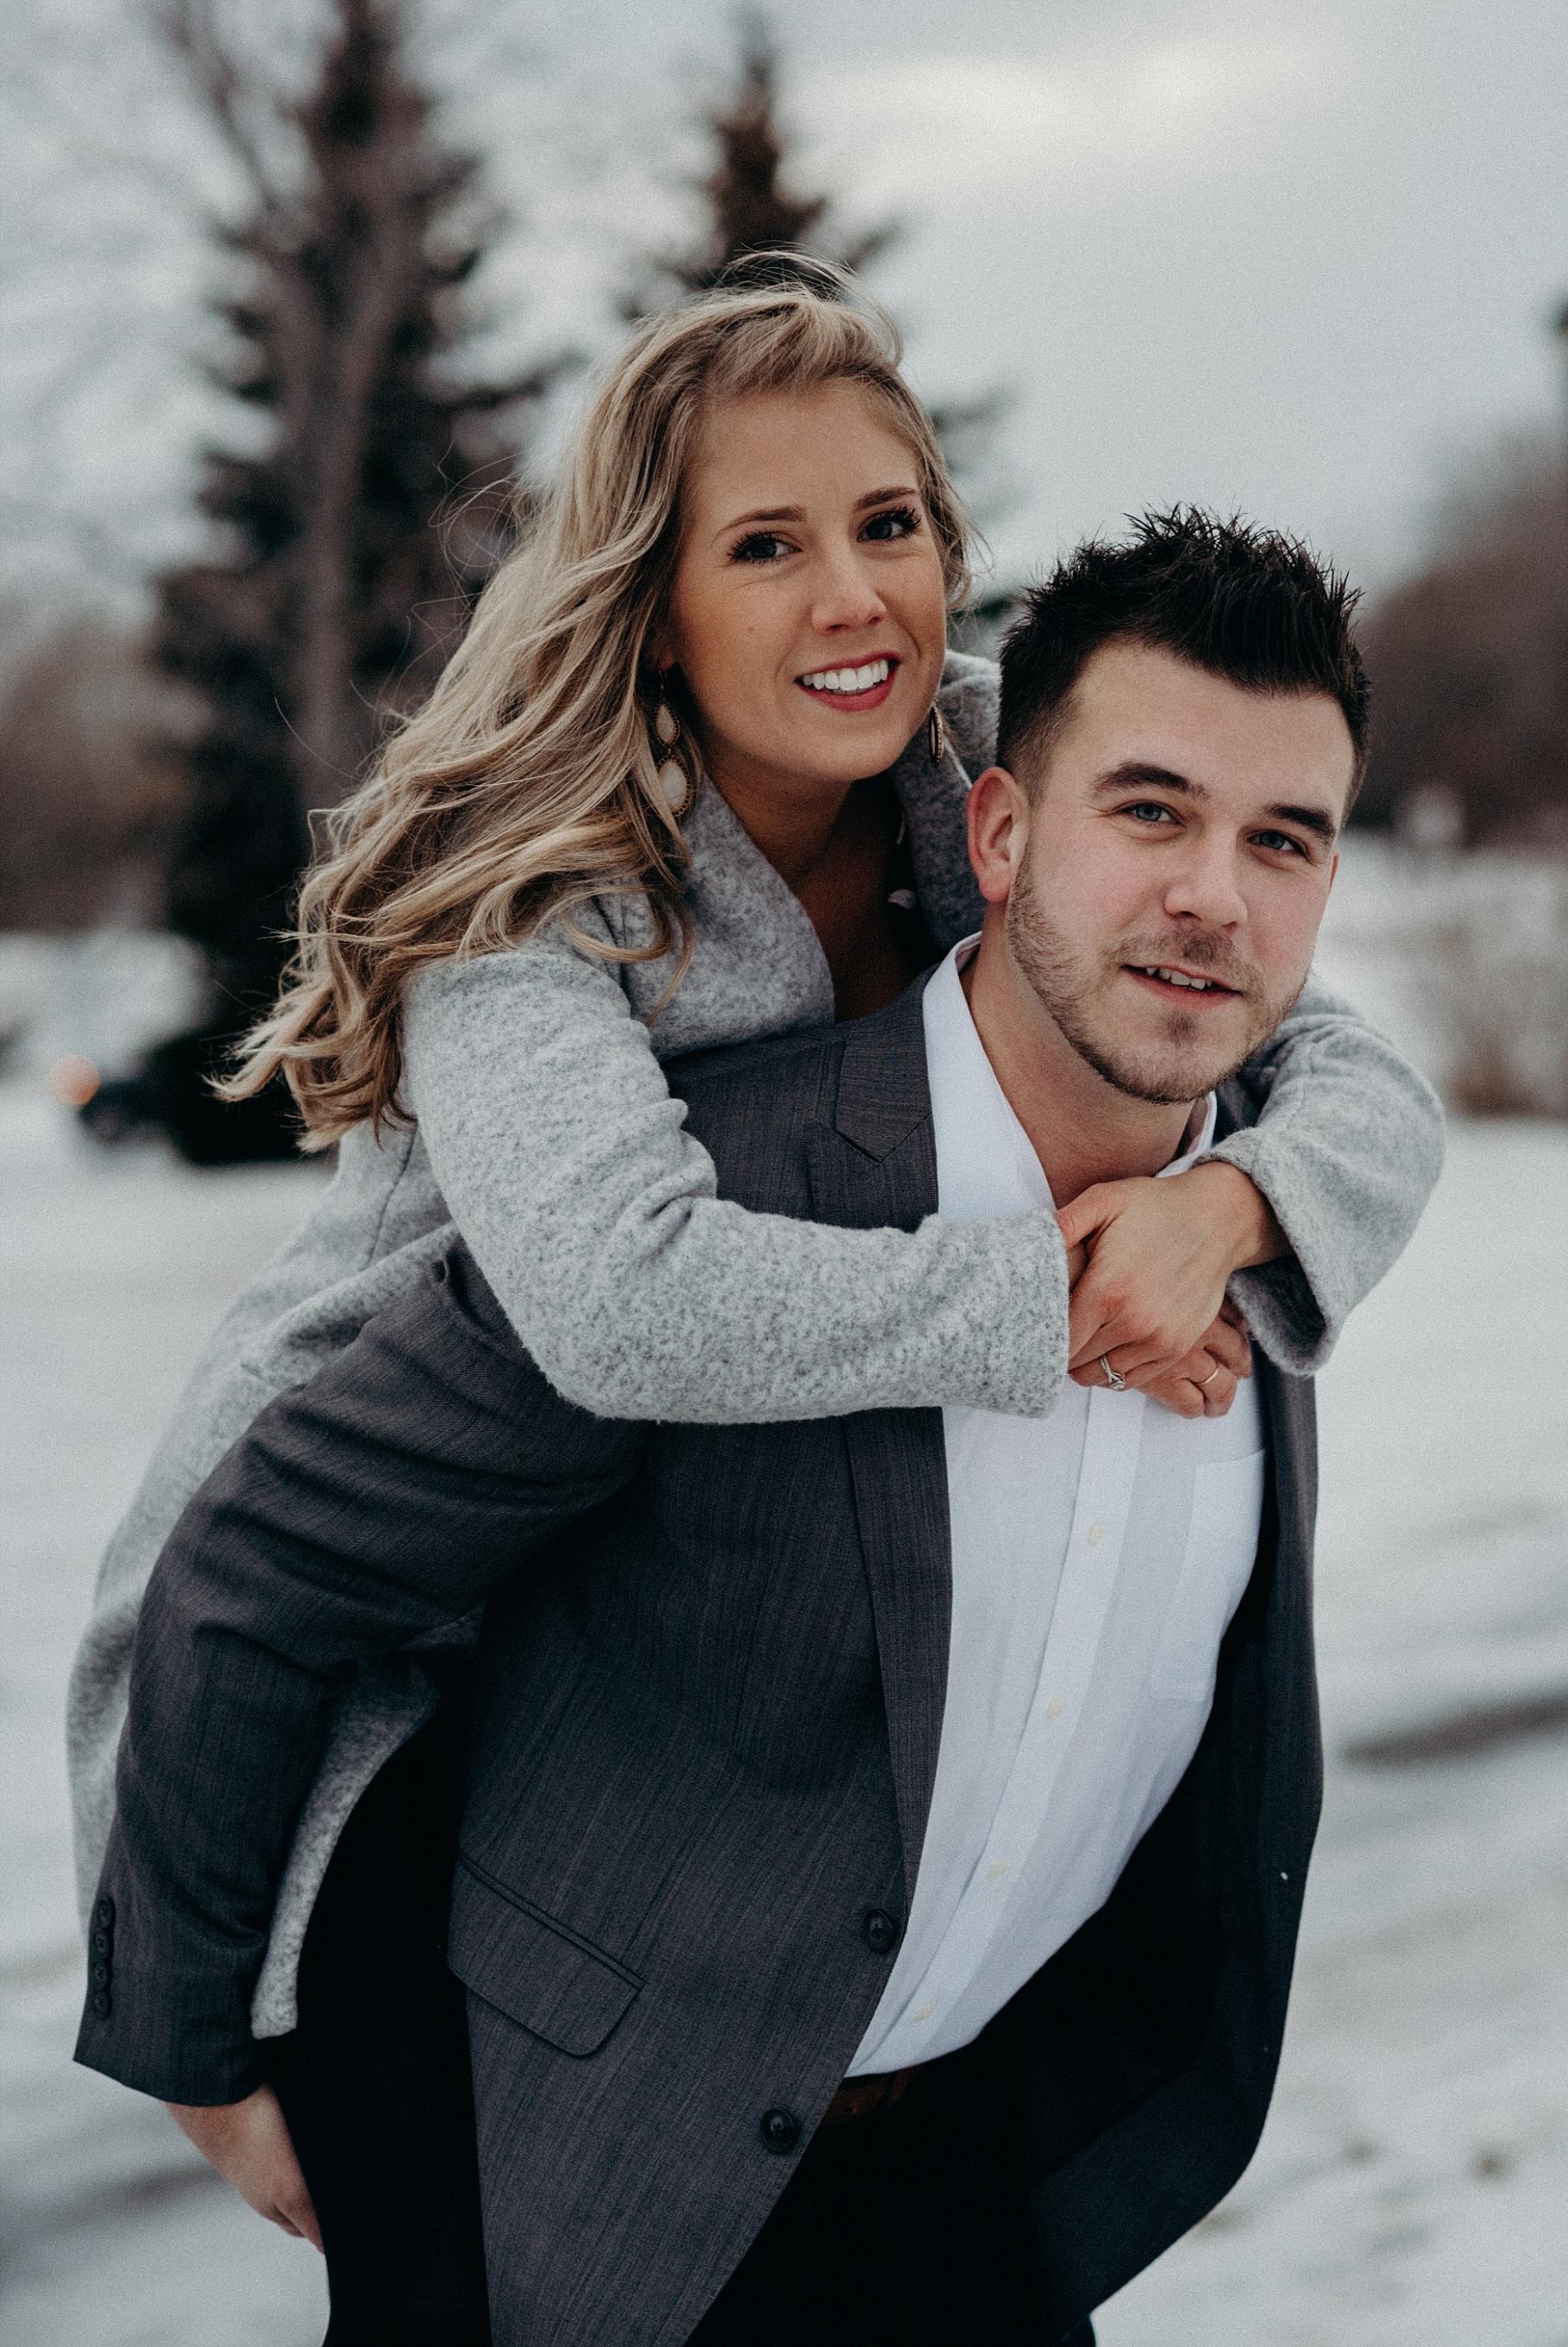 Mocha Tree Studios Ottawa Toronto Montreal Wedding and Engagement Photographer and Videographer Dark Moody Intimate Authentic Modern Romantic Cinematic Best Candid Nepean Sailing Club Andew Haydon Park 15